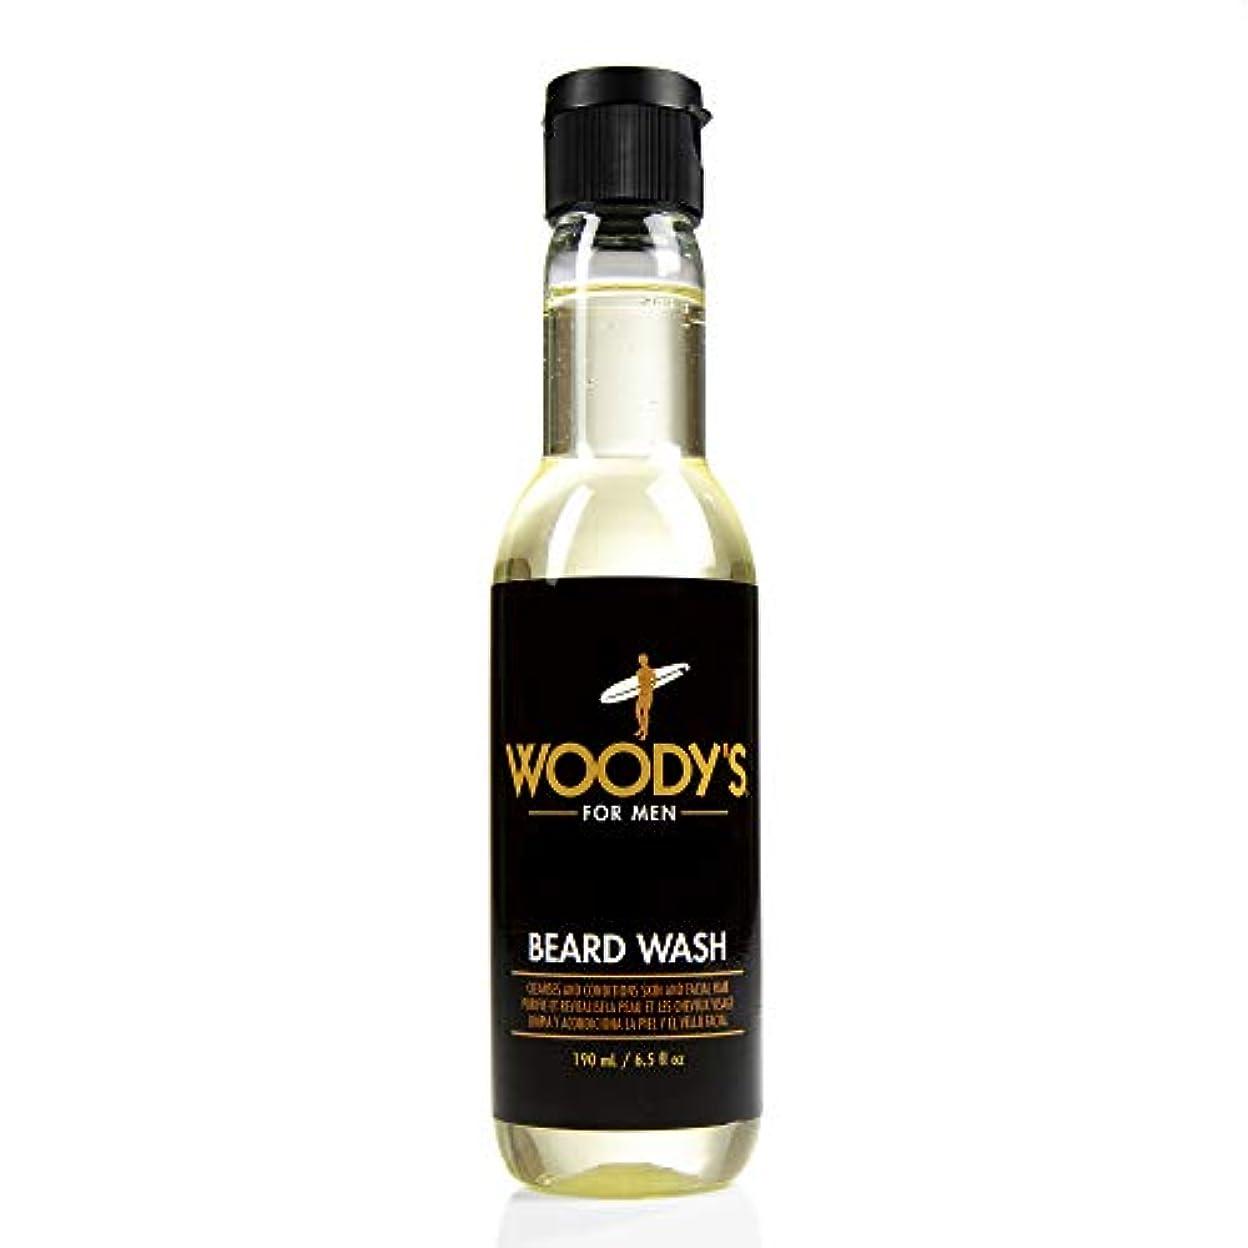 Woody's Quality Grooming - Beard Wash - 6.5oz/190ml